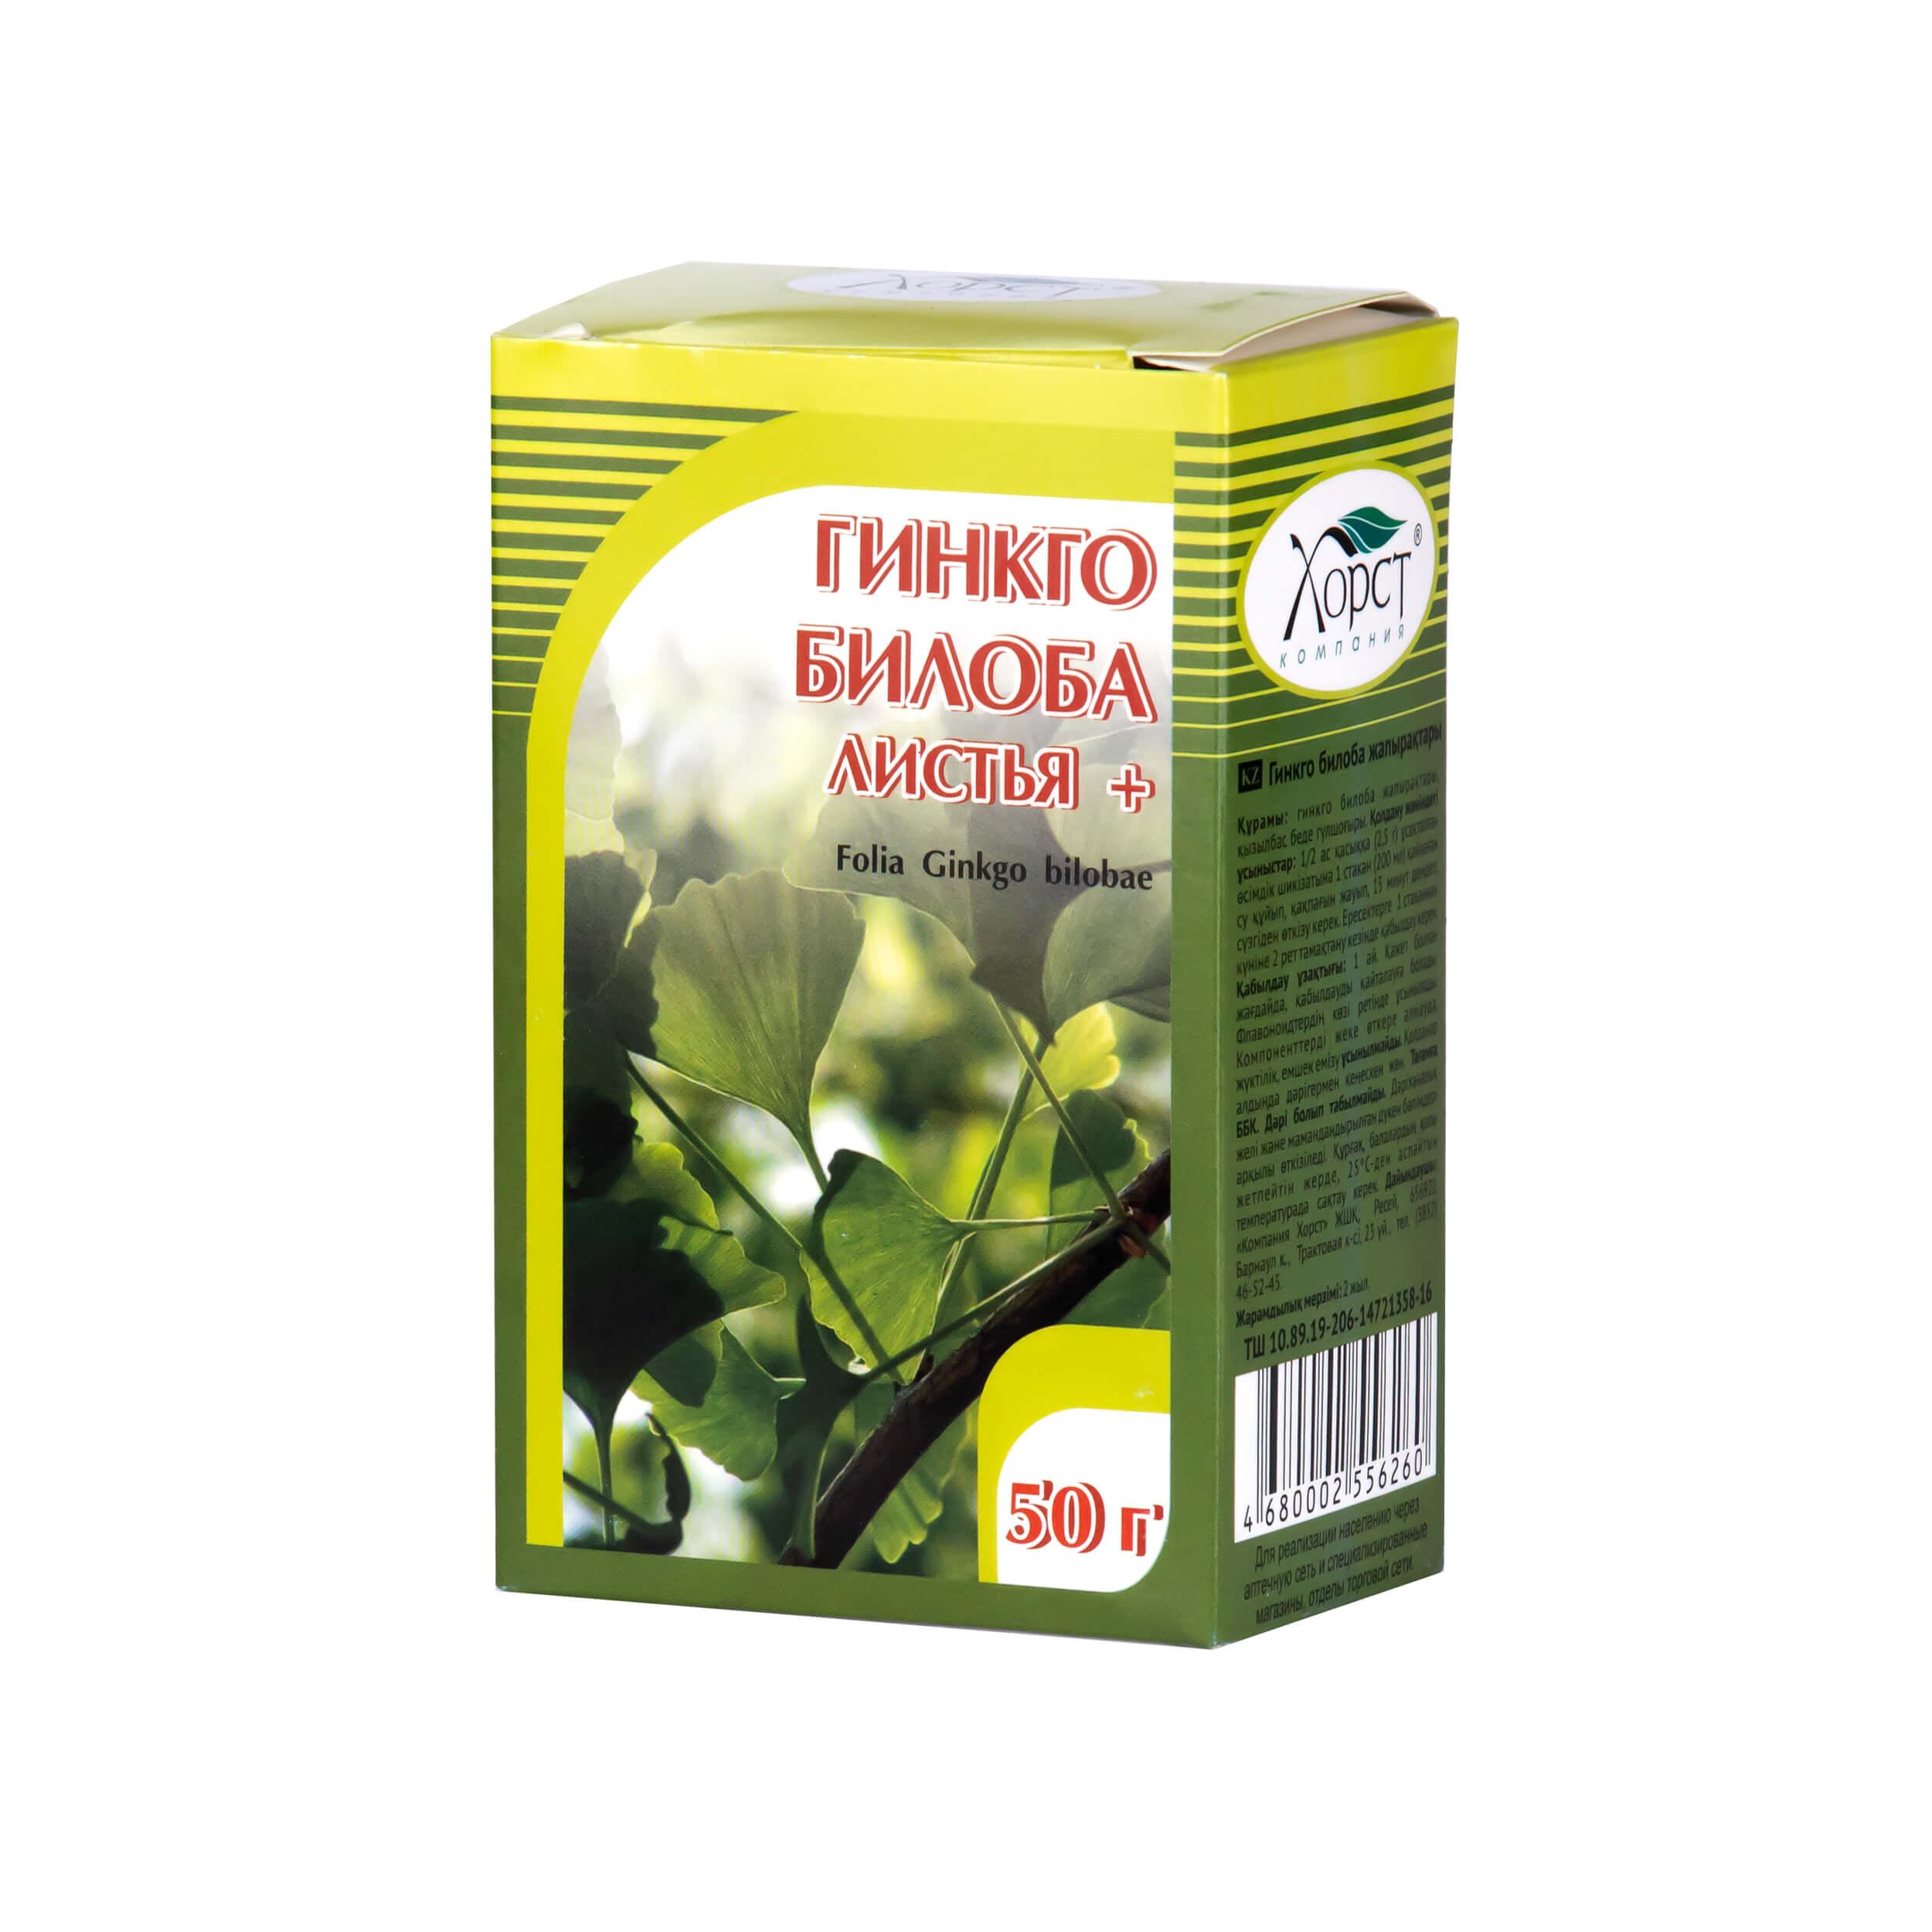 Гинкго билоба (листья, 50 грамм) фото